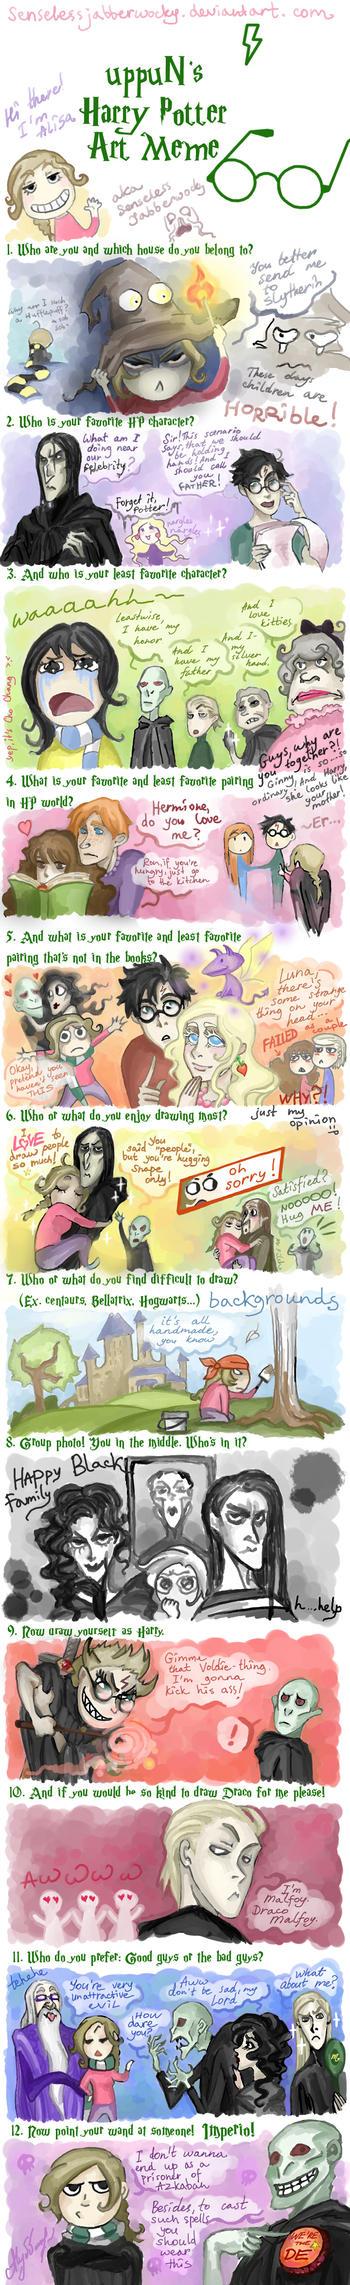 uppuN's HP Art meme by SenselessJabberwocky